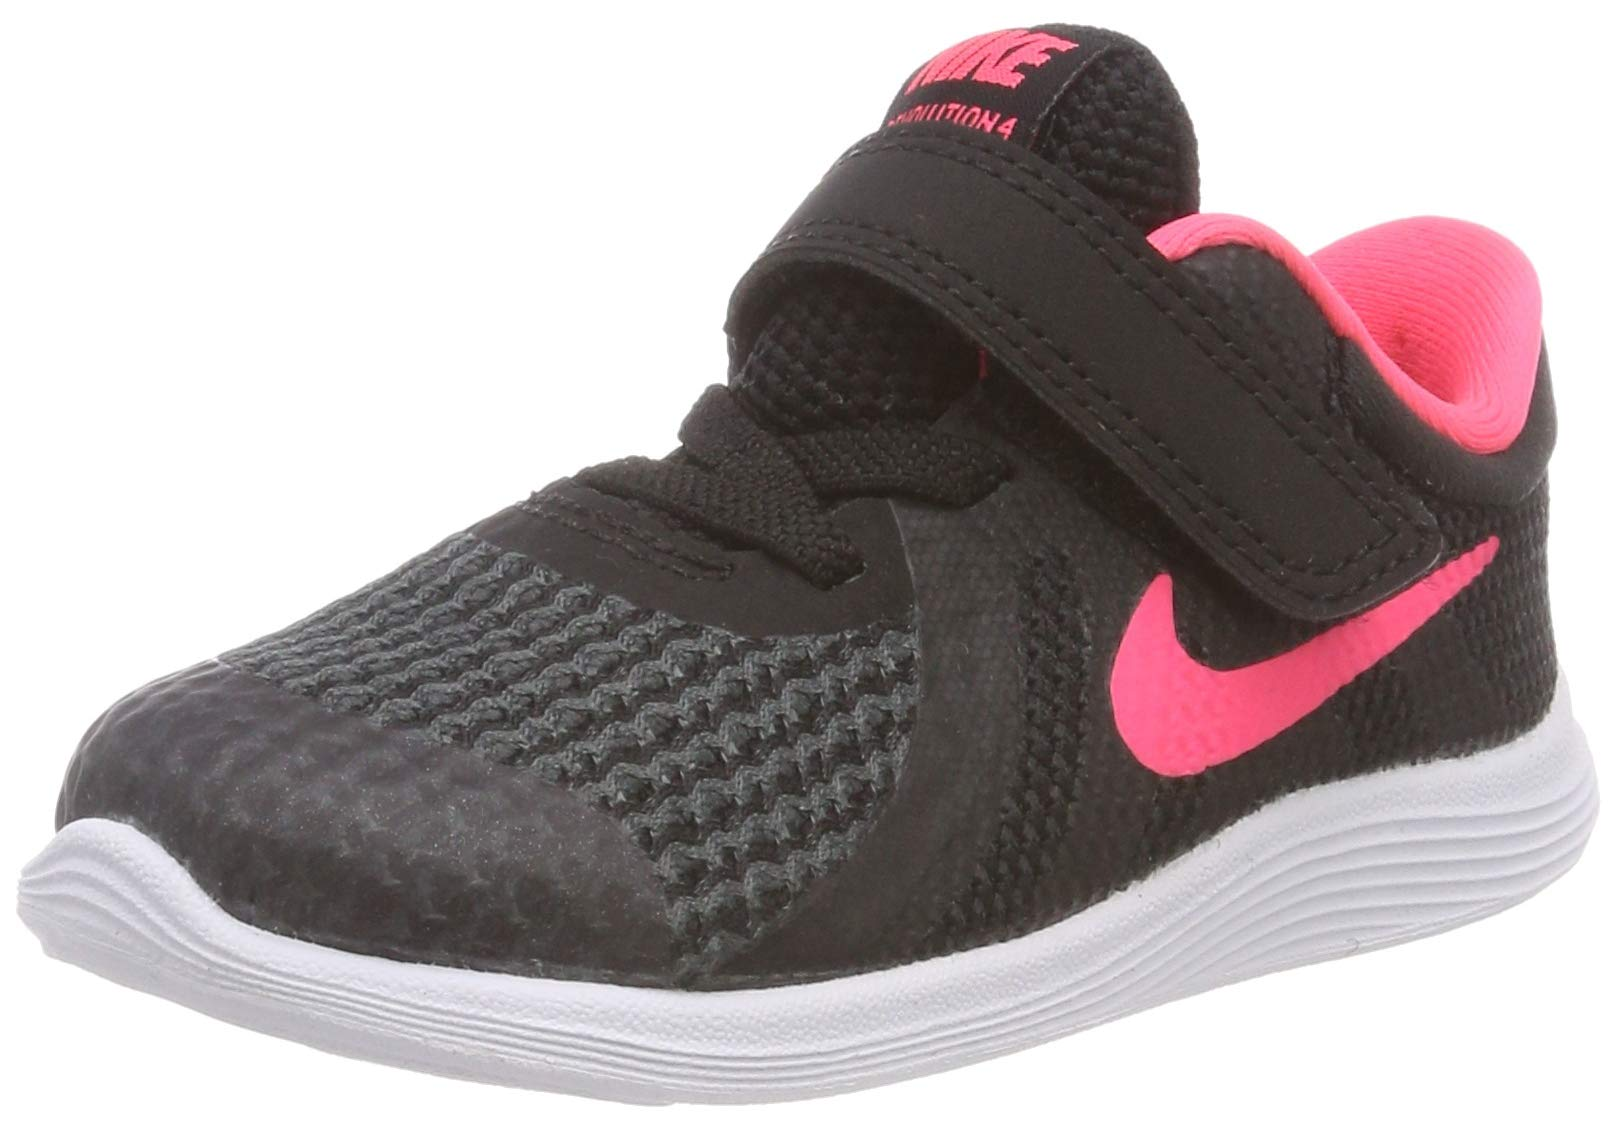 Nike Girls' Revolution 4 (TDV) Running Shoe, Black/Racer Pink-White, 7C Regular US Toddler by Nike